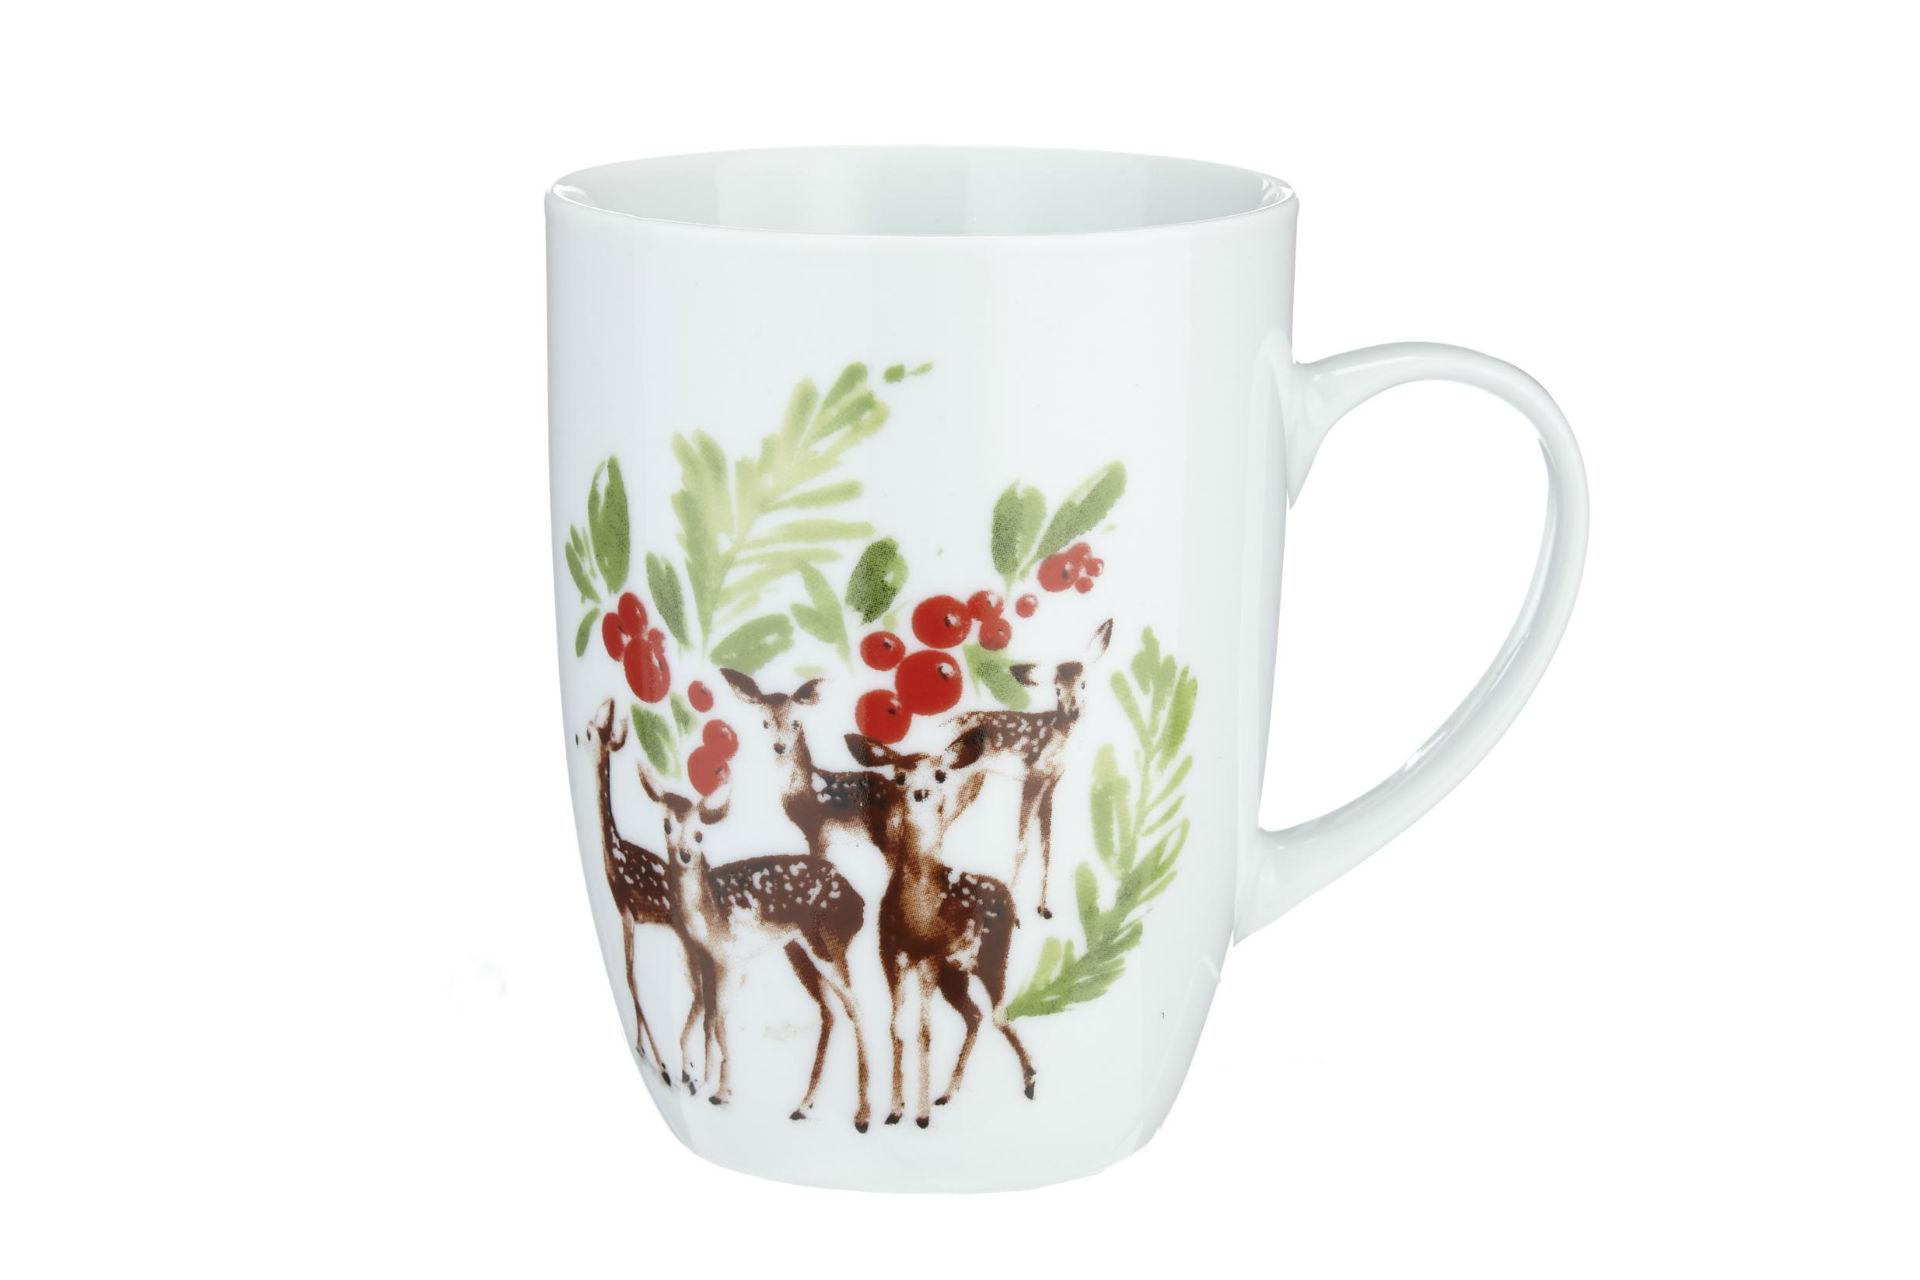 CANVAS Designer Series mug